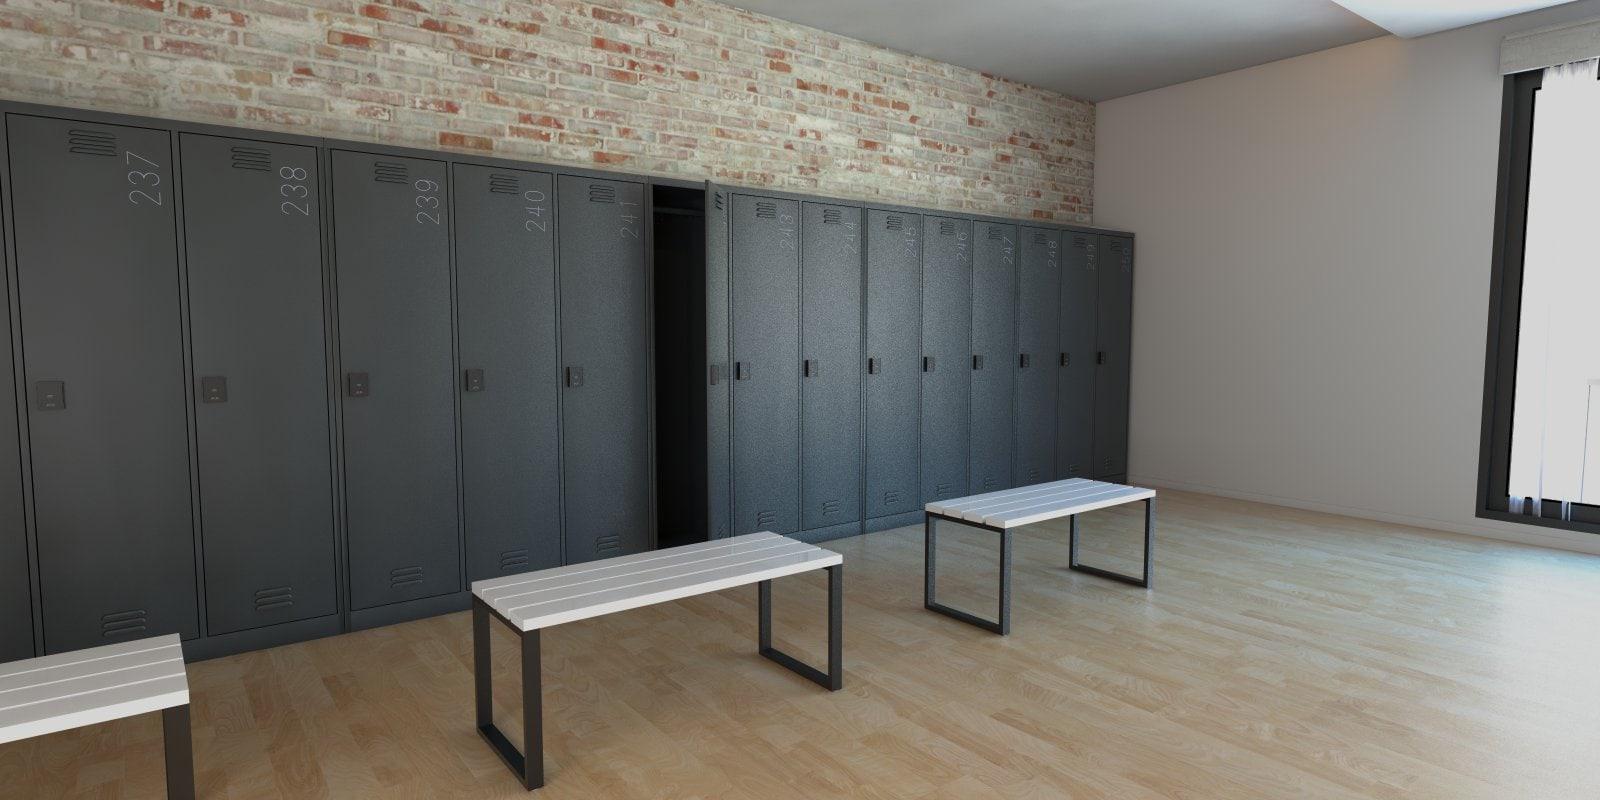 Lockers for employees, metal staff lockers, lockers for personal ...